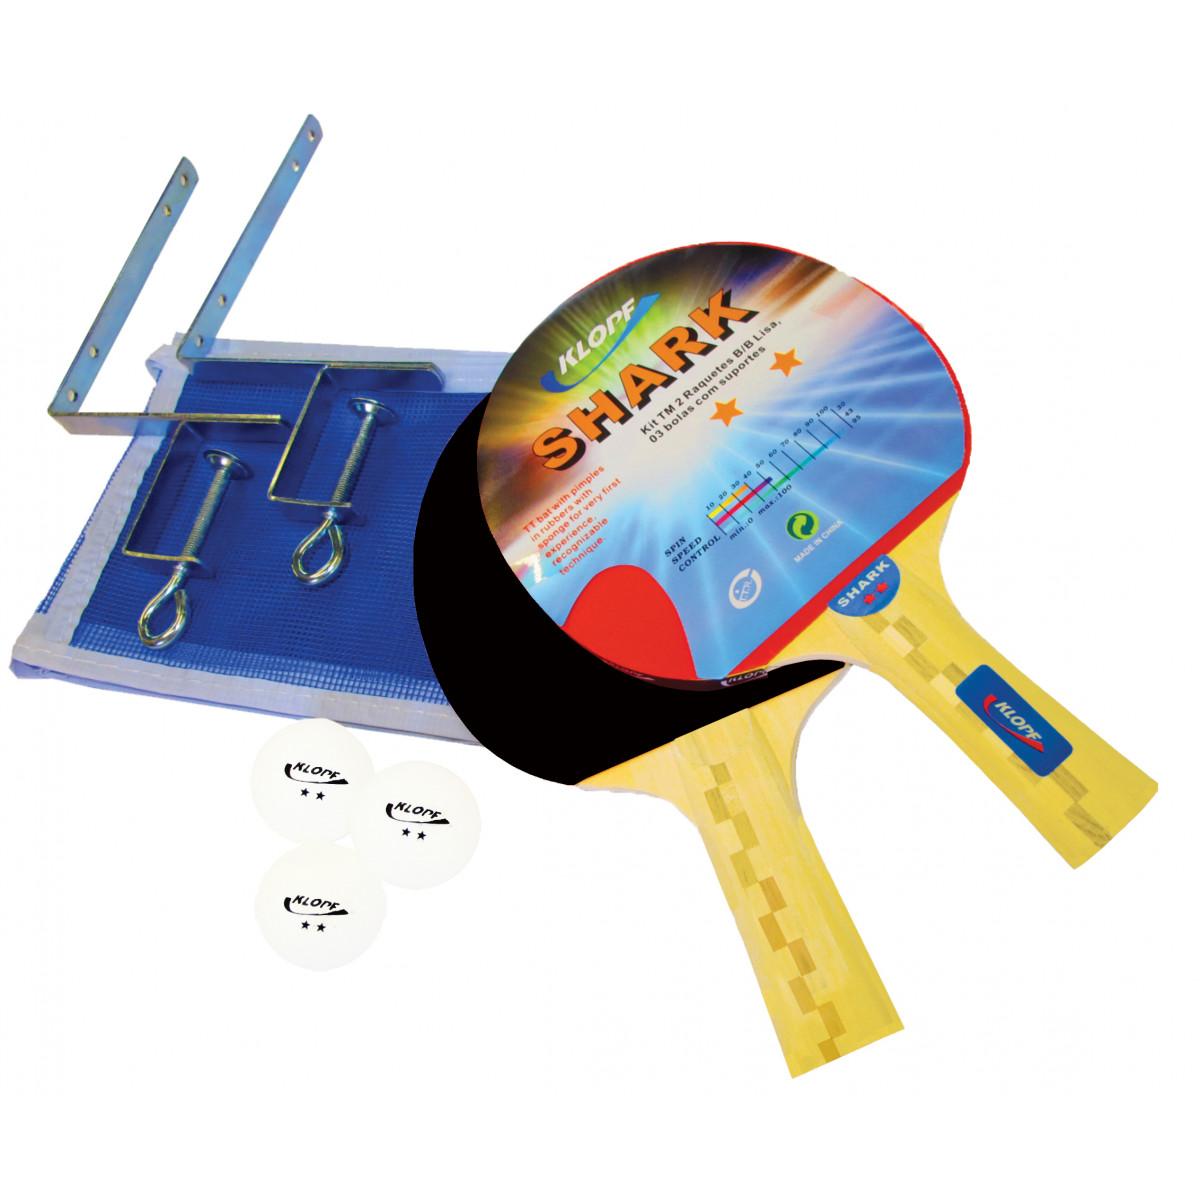 Kit Completo de Tênis de Mesa   Ping pong - Luxo - Klopf - Cód. 5031 ... 1f522bb61af26